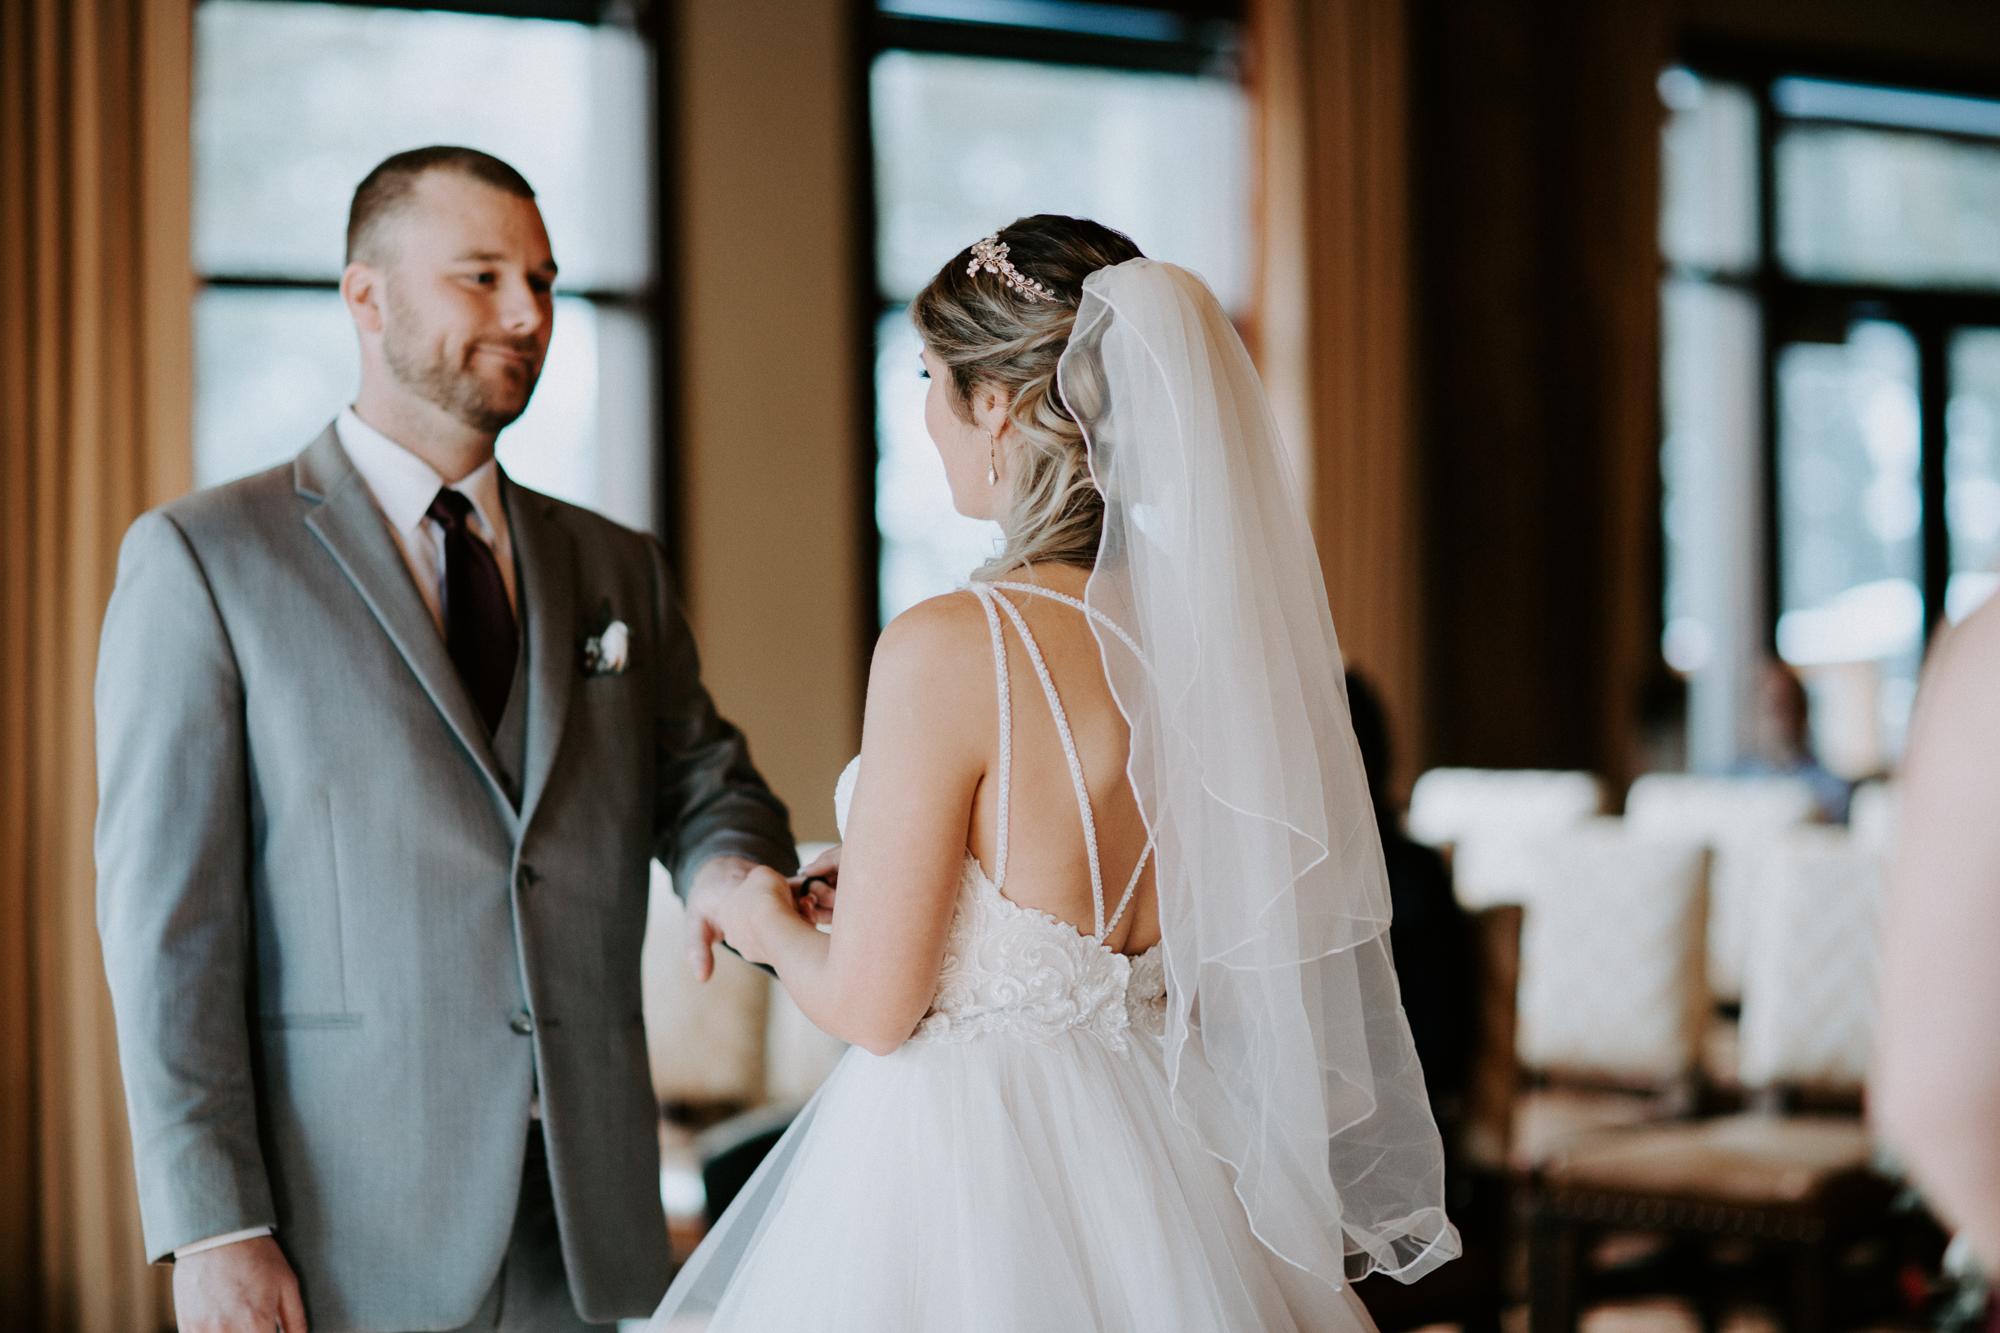 Stewart-Creek-Wedding-AJ-41.jpg